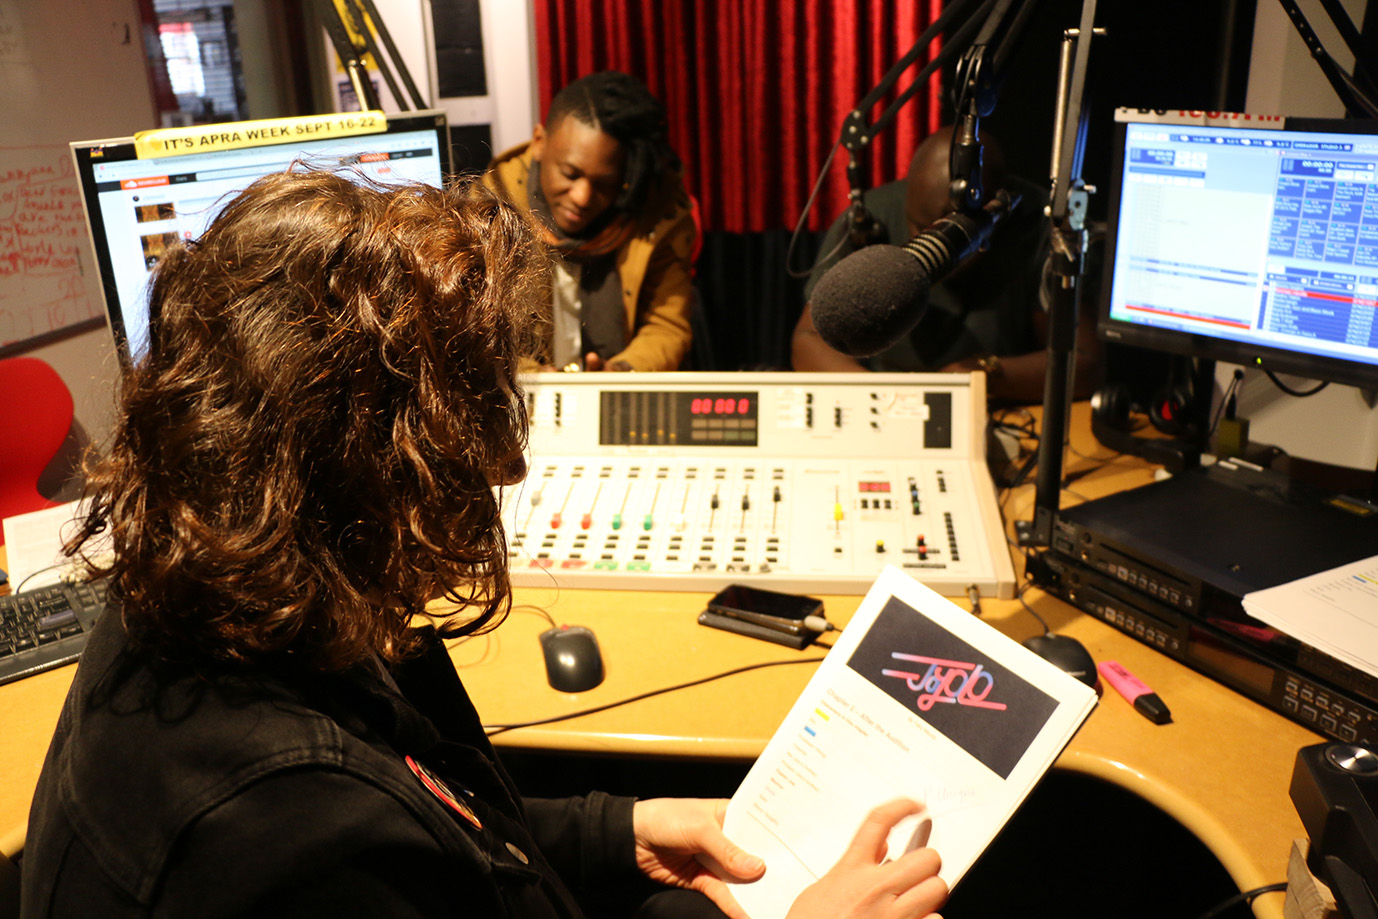 Tenda McFly Zii Music Rap JoYOLO Radio Story